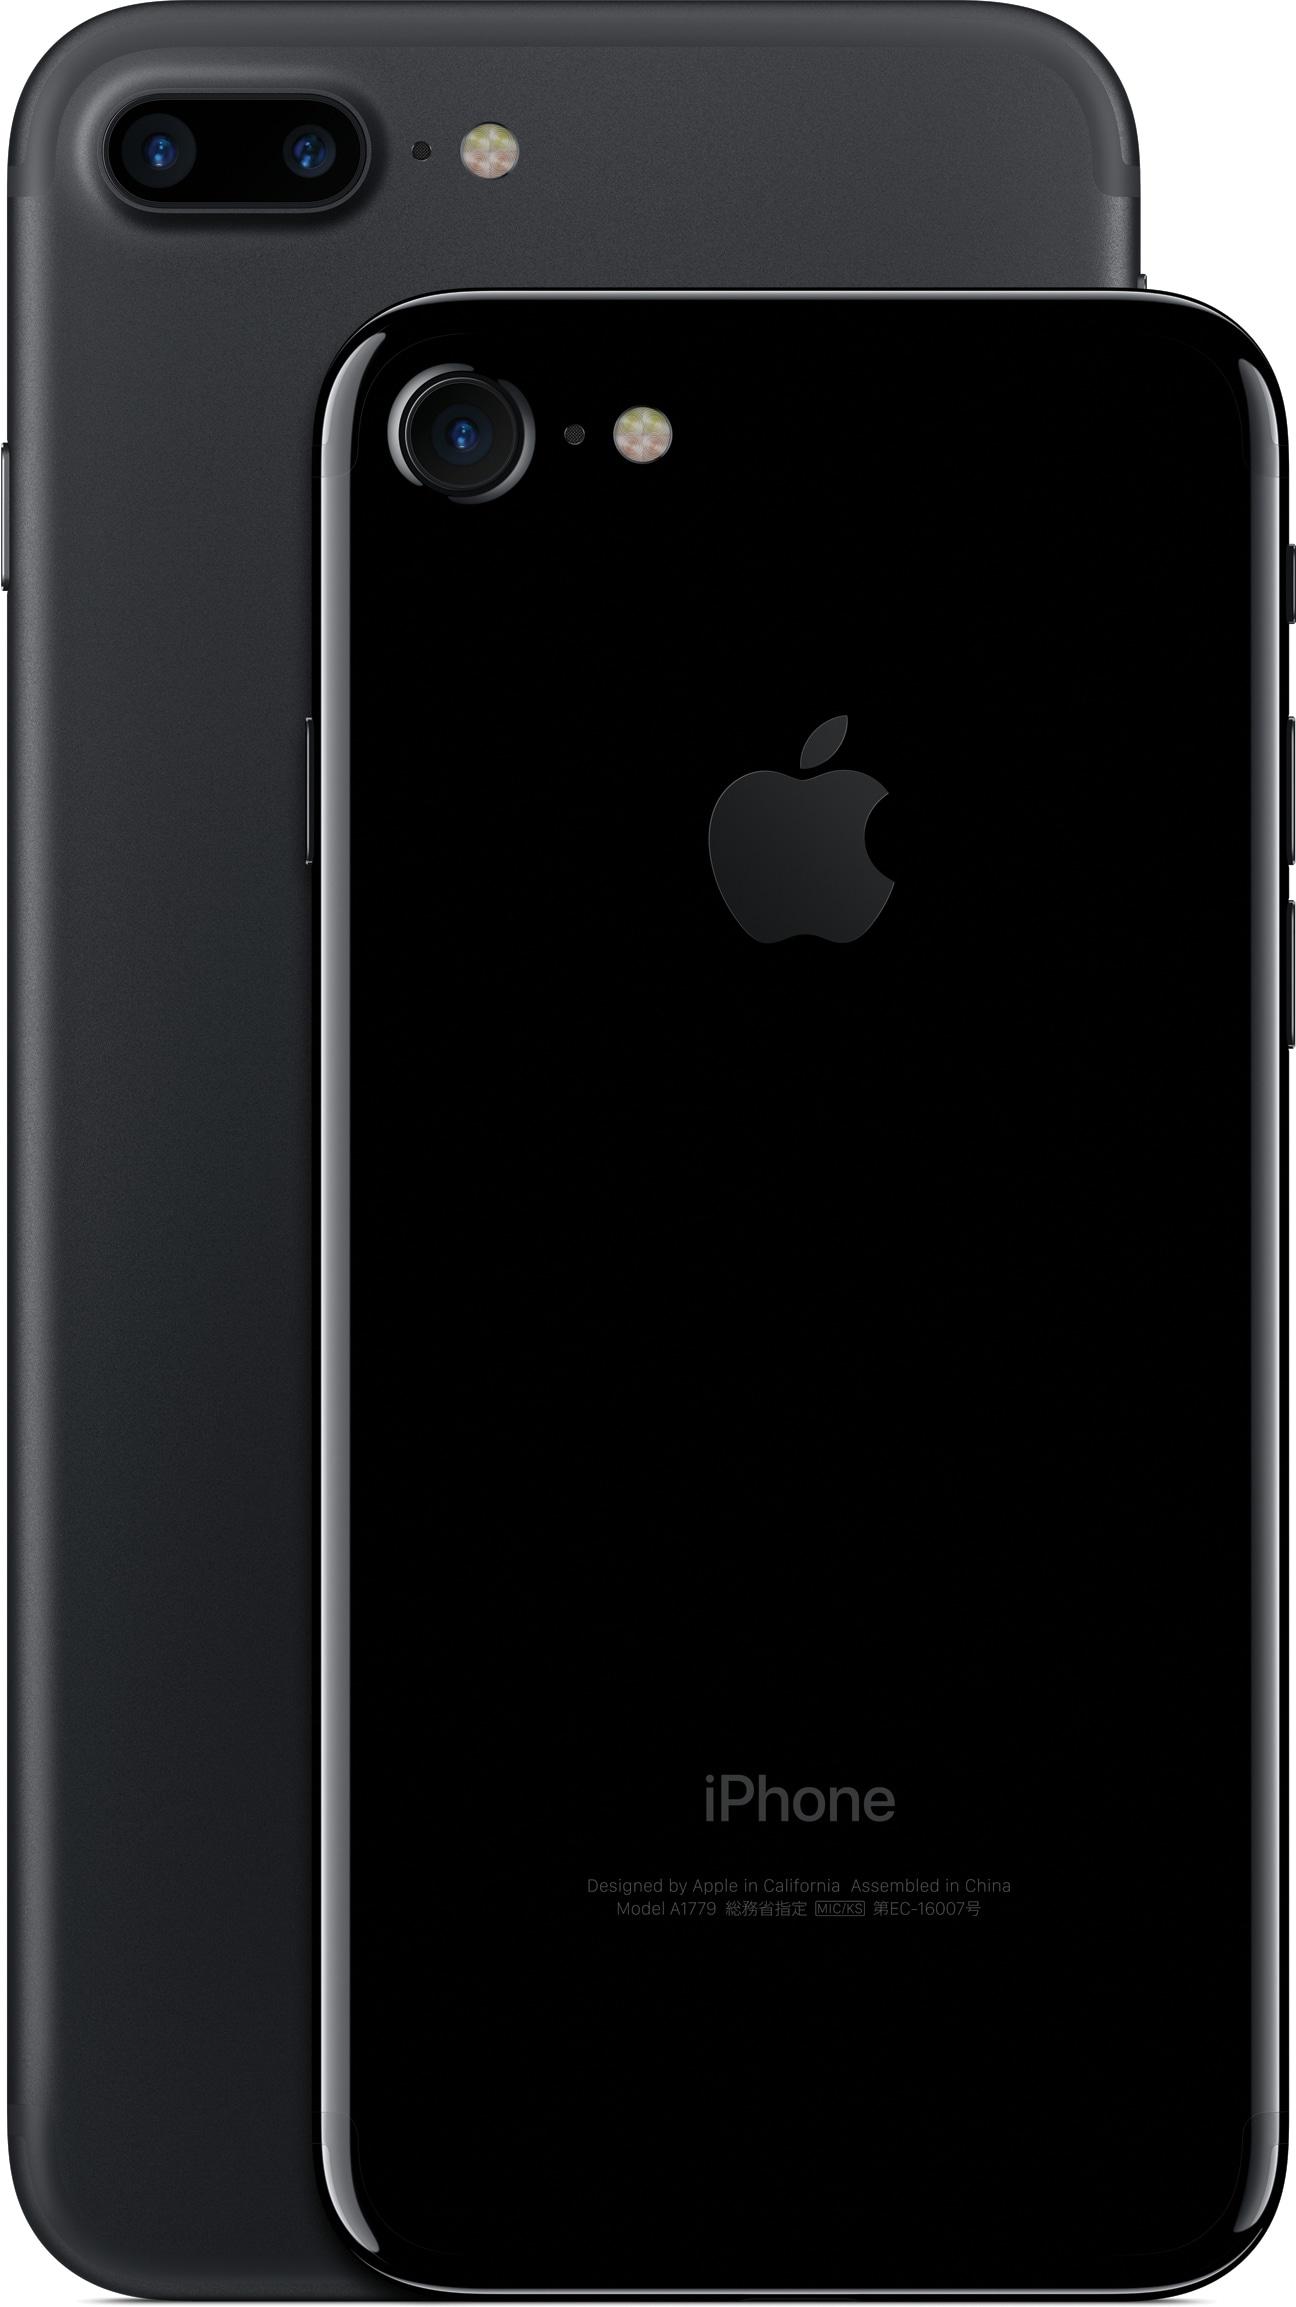 iPhone 7 Plus preto de costas e iPhone 7 jet black de costas